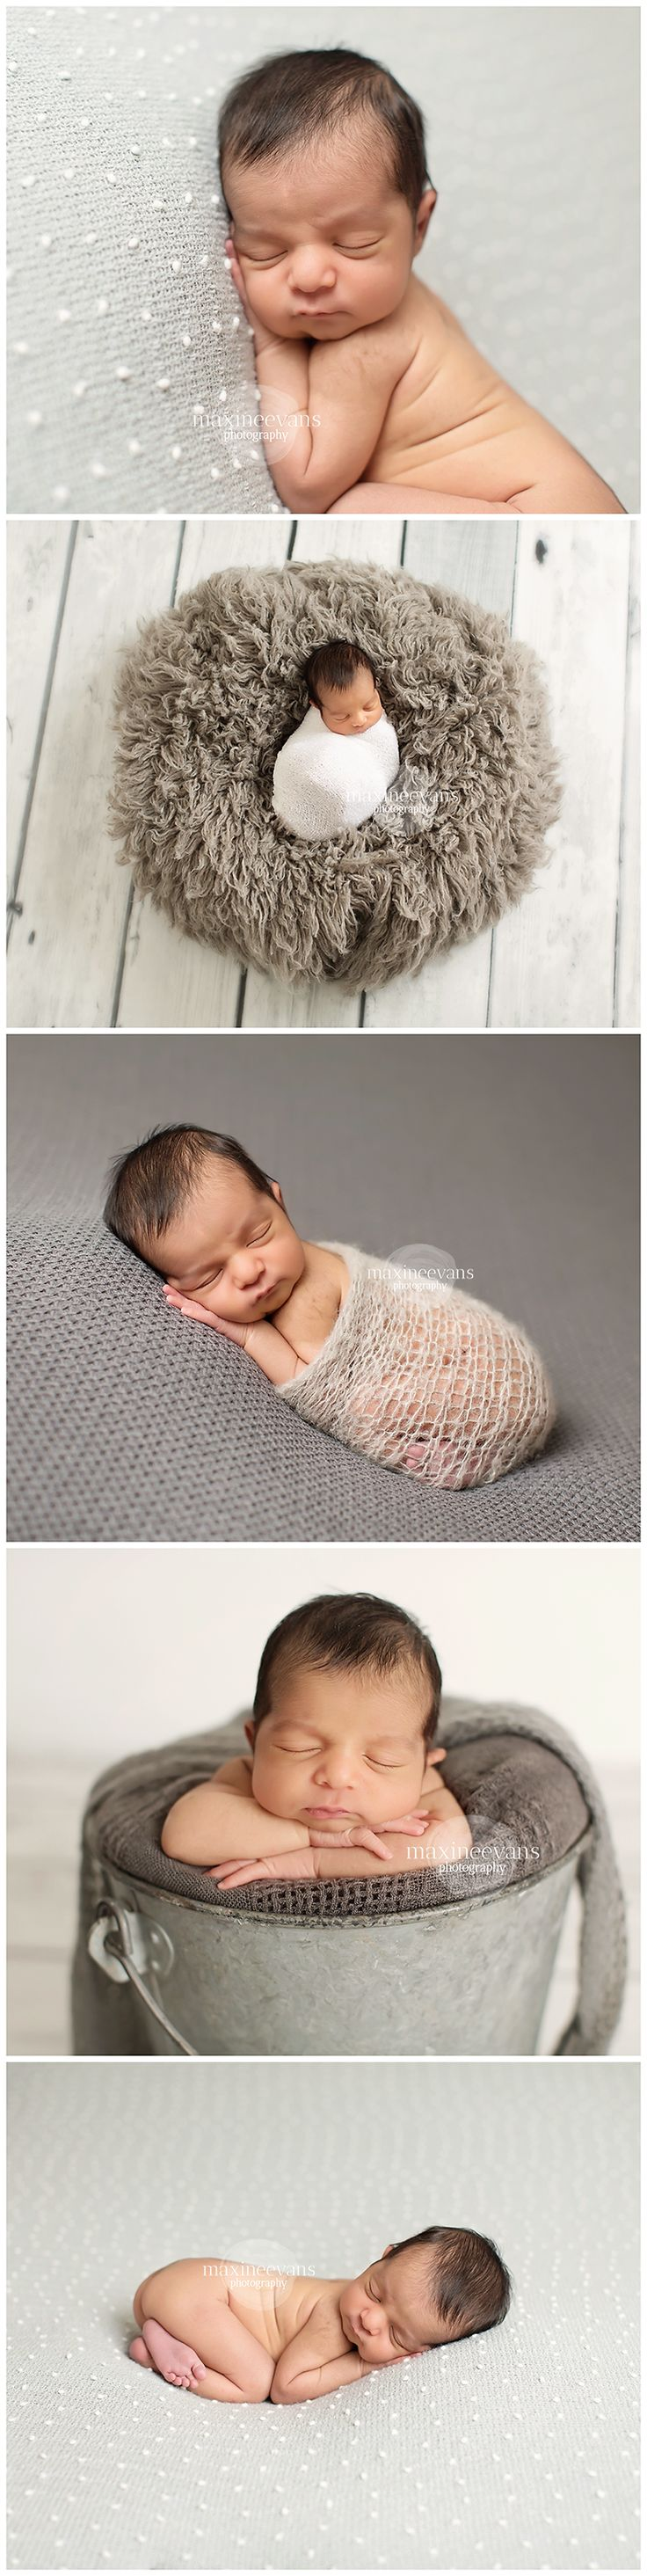 Los Angeles Newborn Baby Photographer - Maxine Evans Photography   www.maxineevansphotography.com  Los Angeles   Thousand Oaks   Woodland Hills   West LA   Agoura Hills #losangelesnewbornbaby #losangelesnewborn #losangelesnewbornphotographer